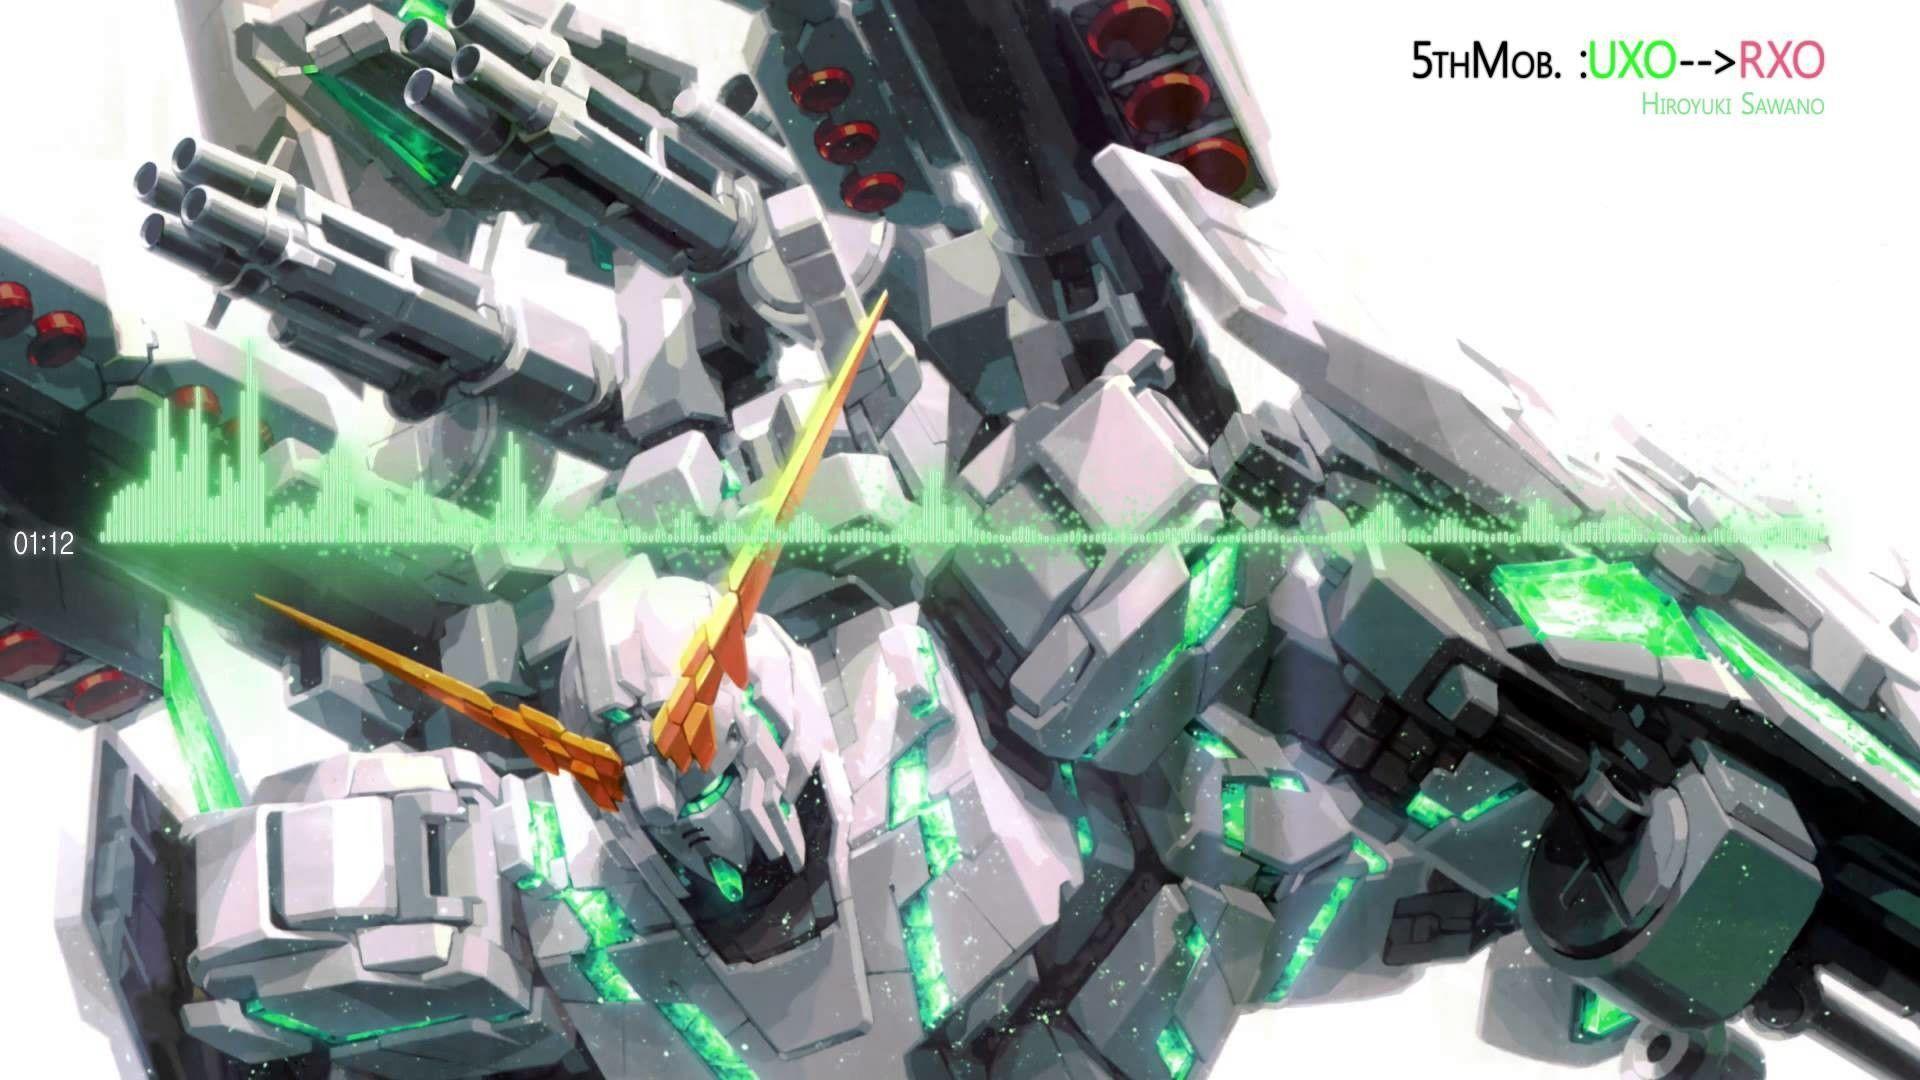 Gundam Unicorn Wallpapers Top Free Gundam Unicorn Backgrounds Wallpaperaccess